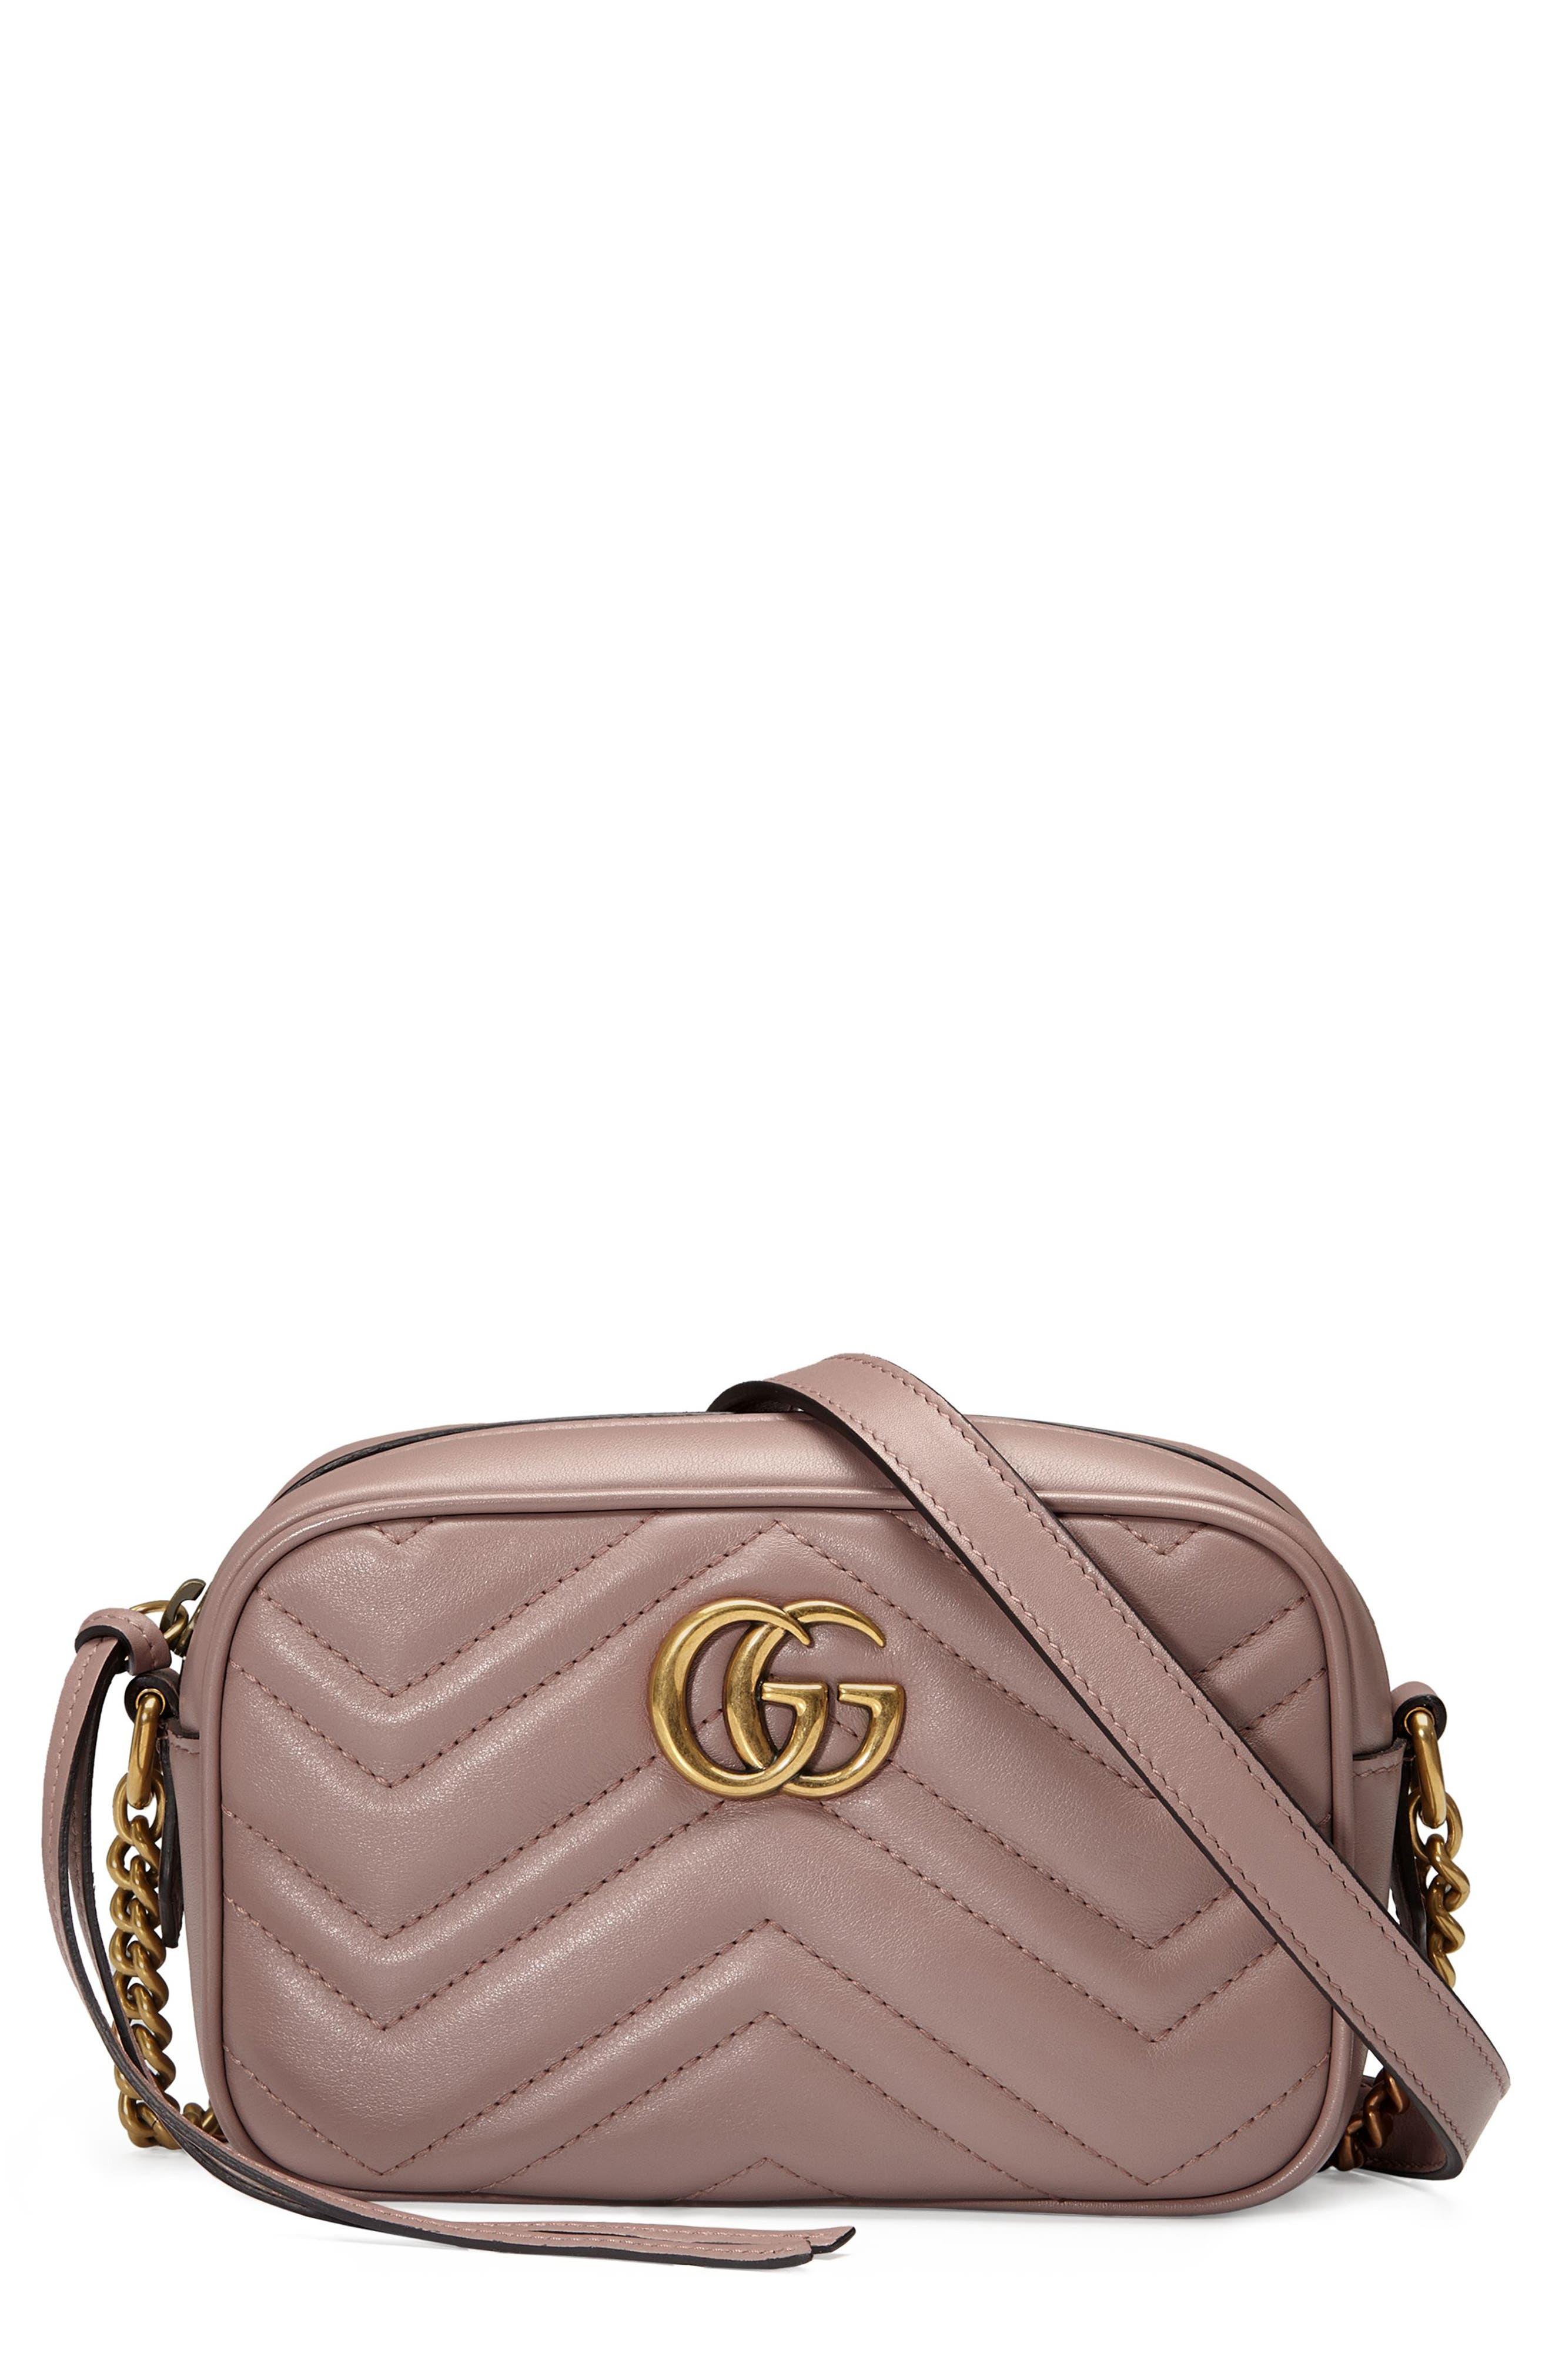 0aa5988c4ba004 Gucci Gg Marmont 2.0 Matelasse Leather Shoulder Bag - Beige